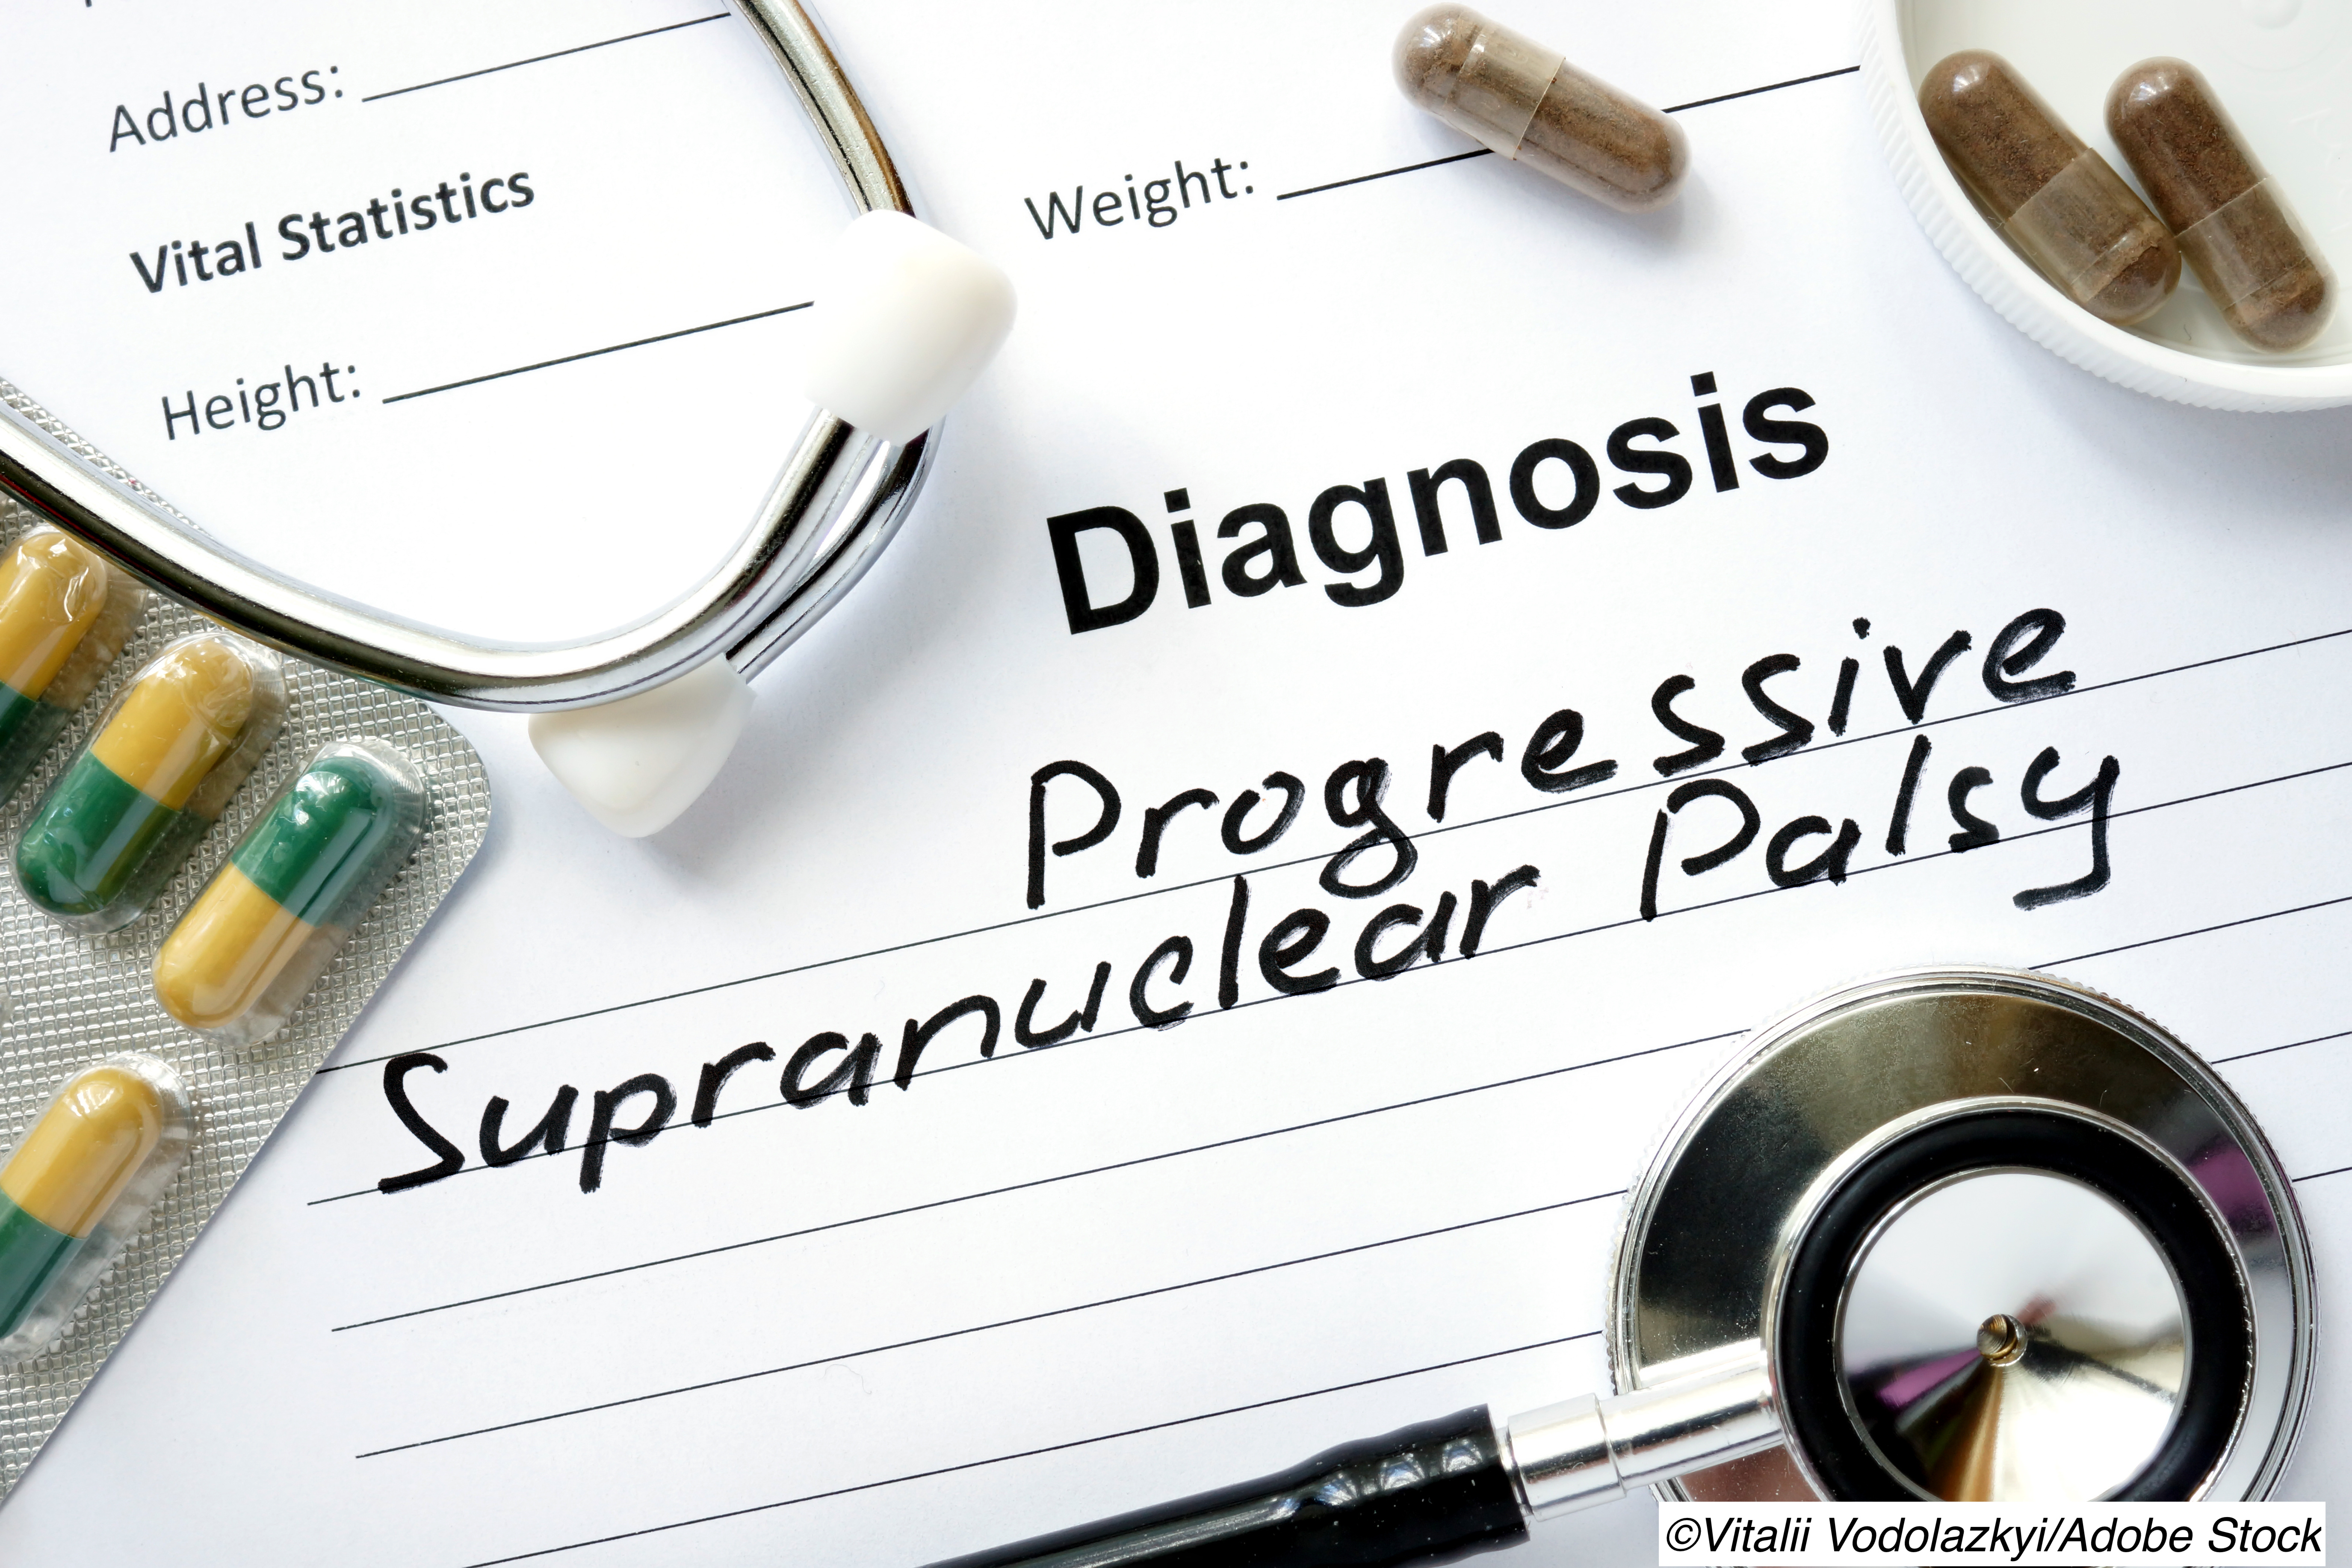 Tau Monoclonal Antibody Fails in Progressive Supranuclear Palsy